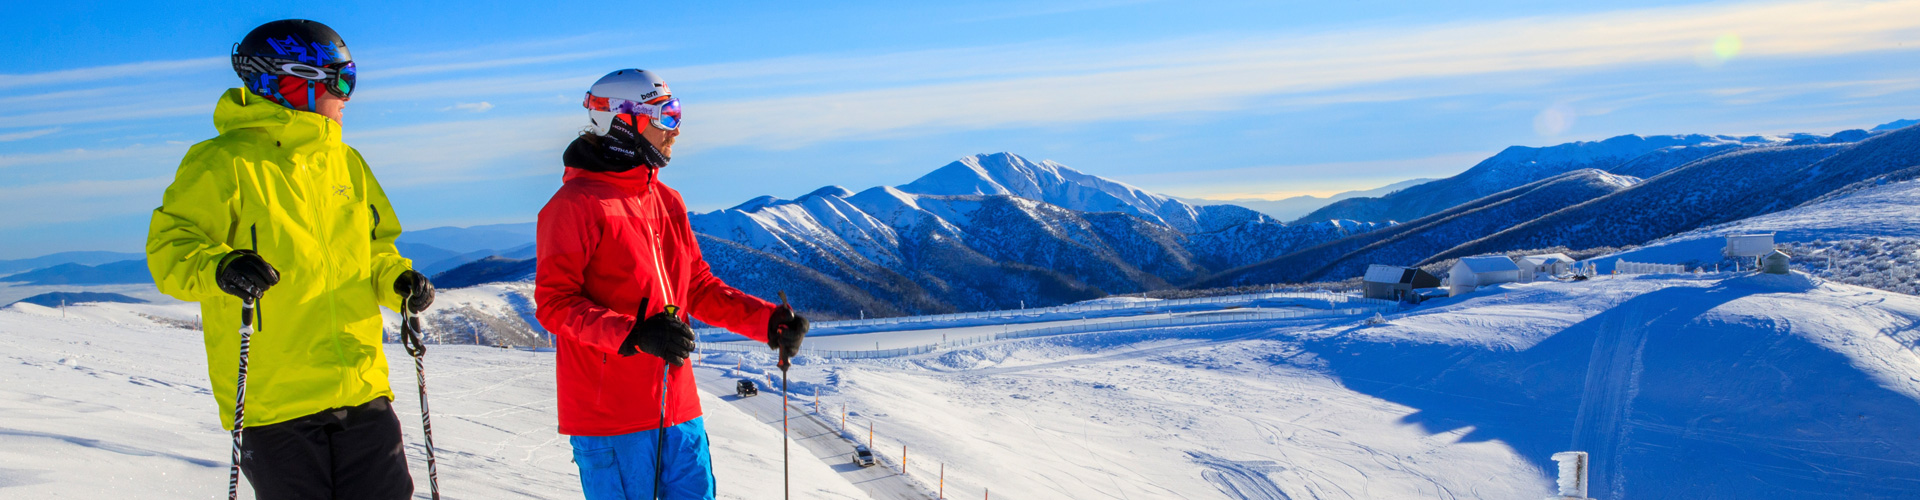 skiing mt hotham